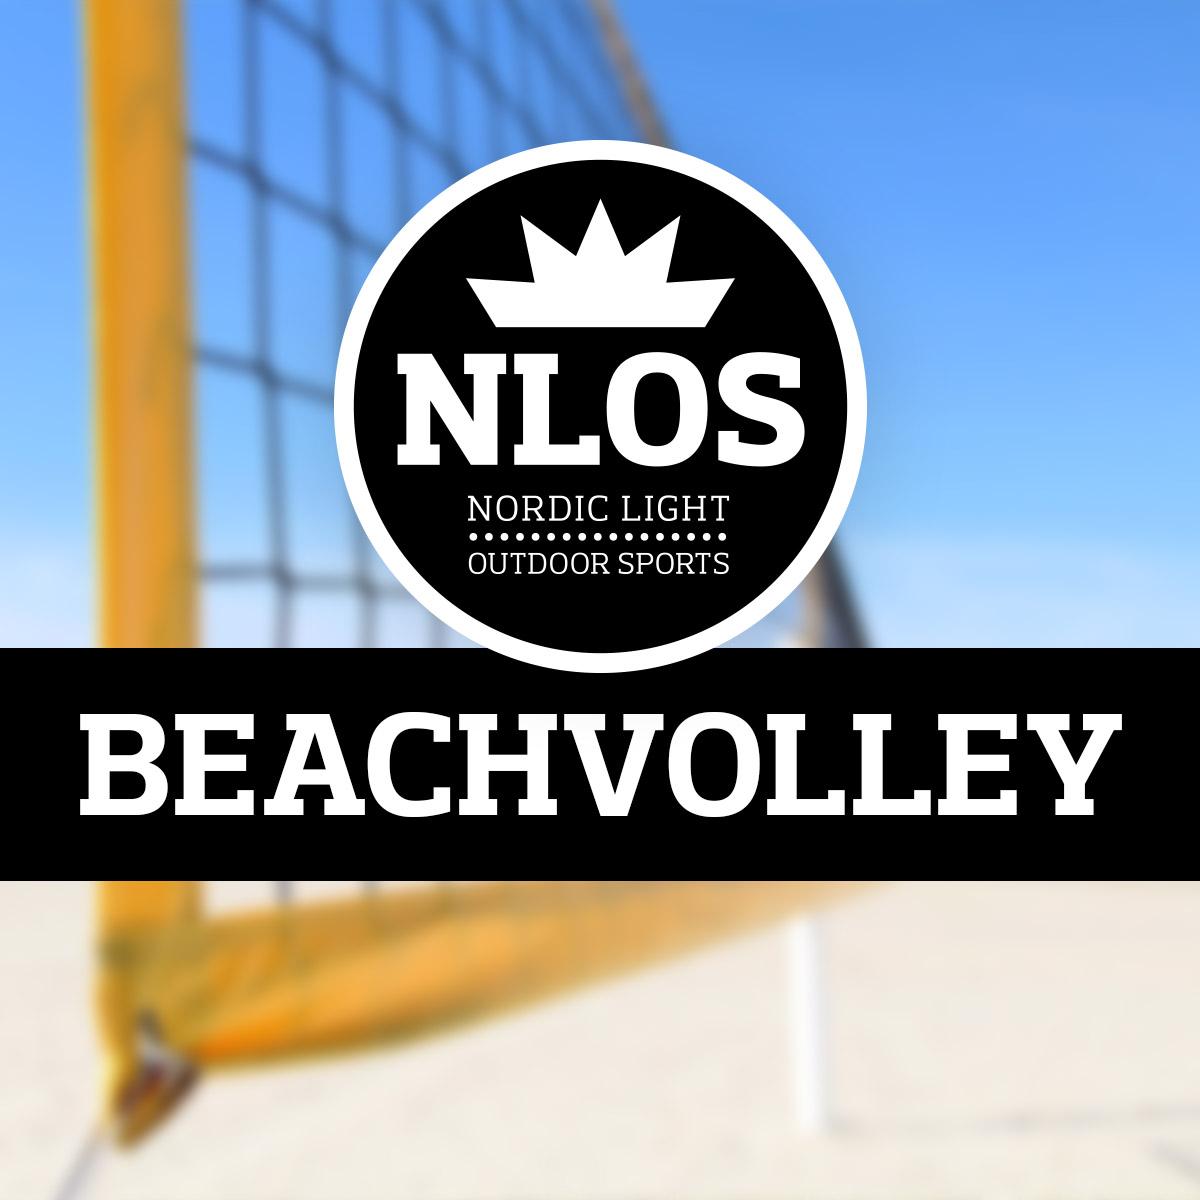 NLOS Beachvolley